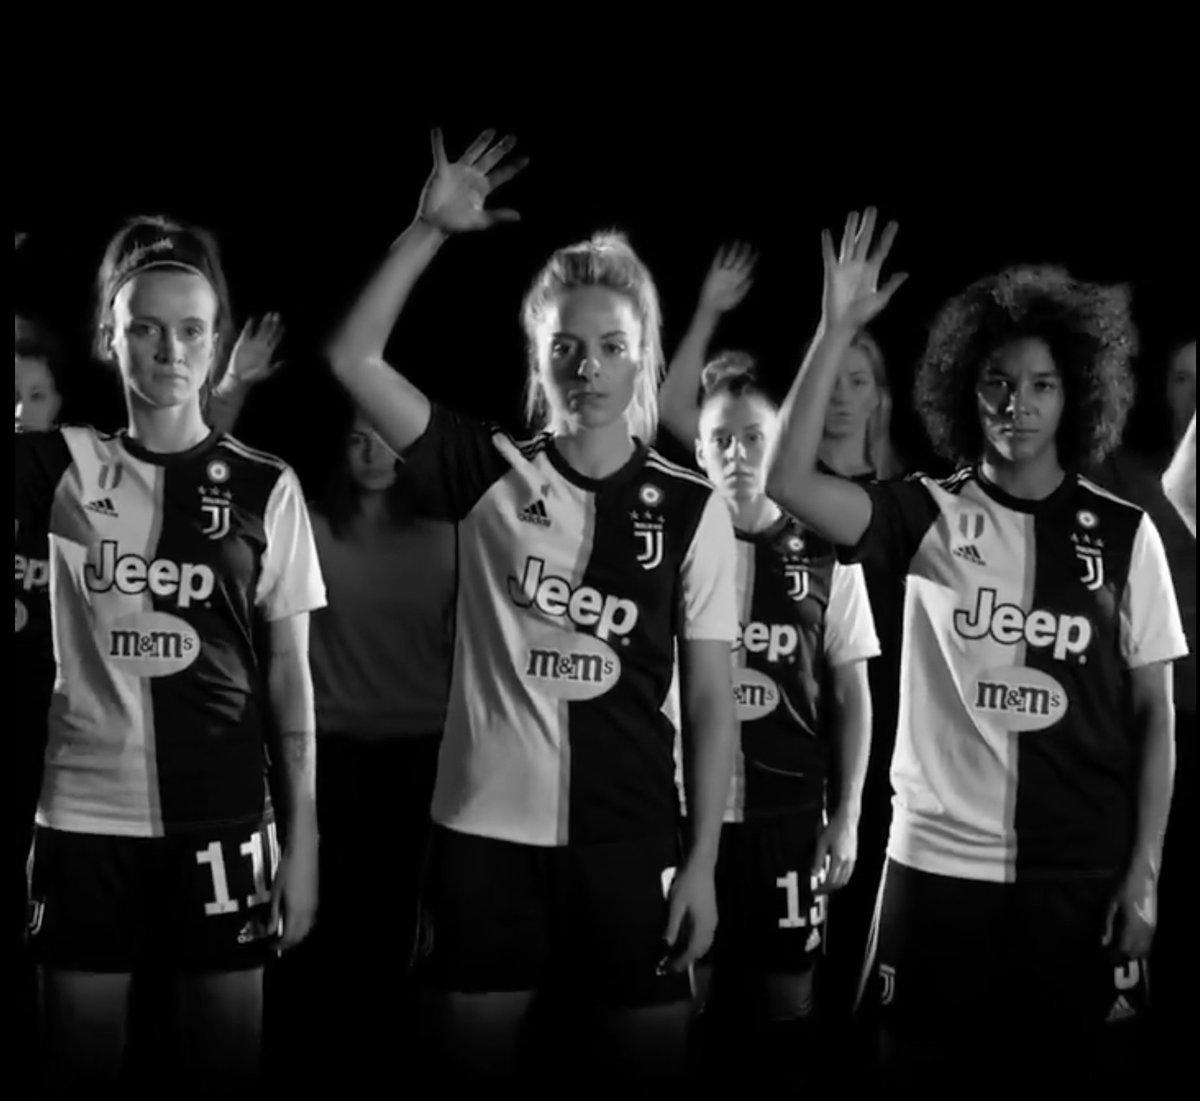 ✋Raise your hand! Stop violence against women. #OrangeTheWorld